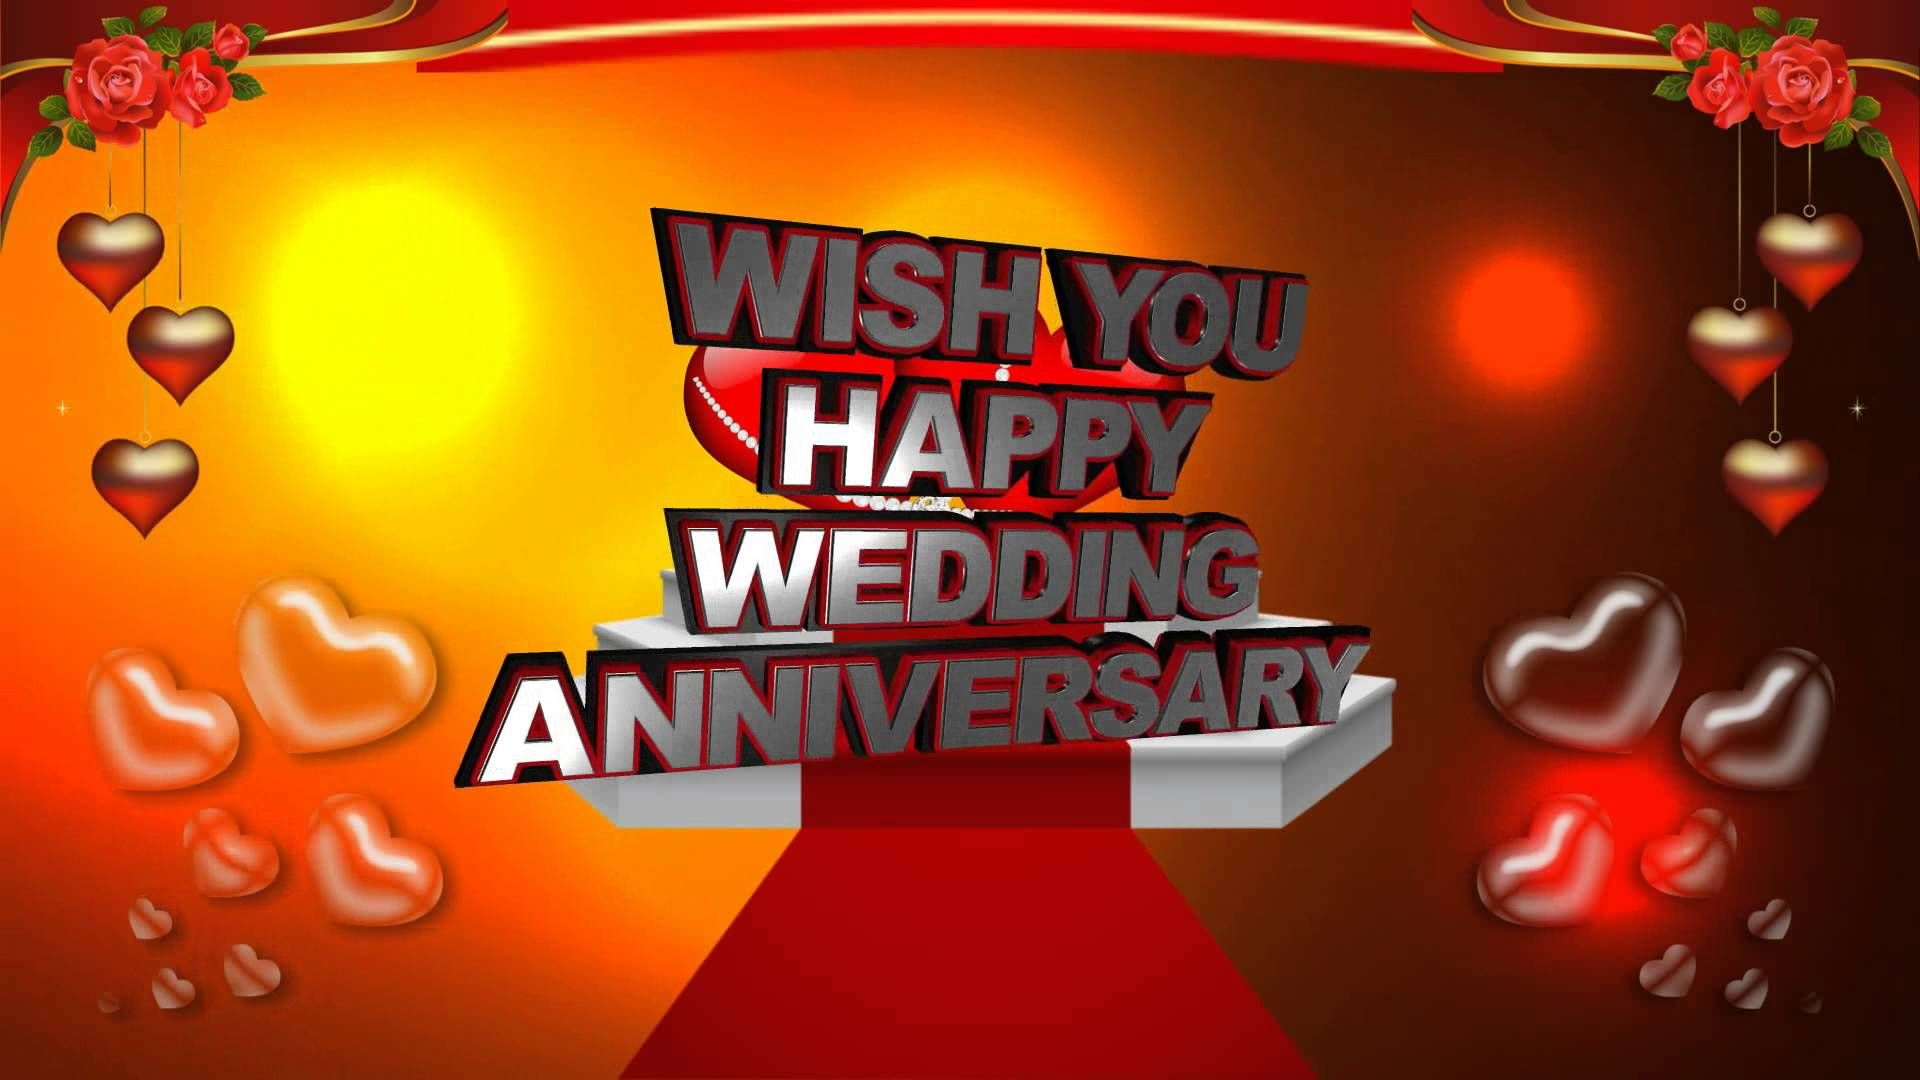 Happy Anniversary Greetings Wedding Anniversary Animation Wedding A Wedding Anniversary Wishes Anniversary Wishes For Couple Happy Wedding Anniversary Wishes